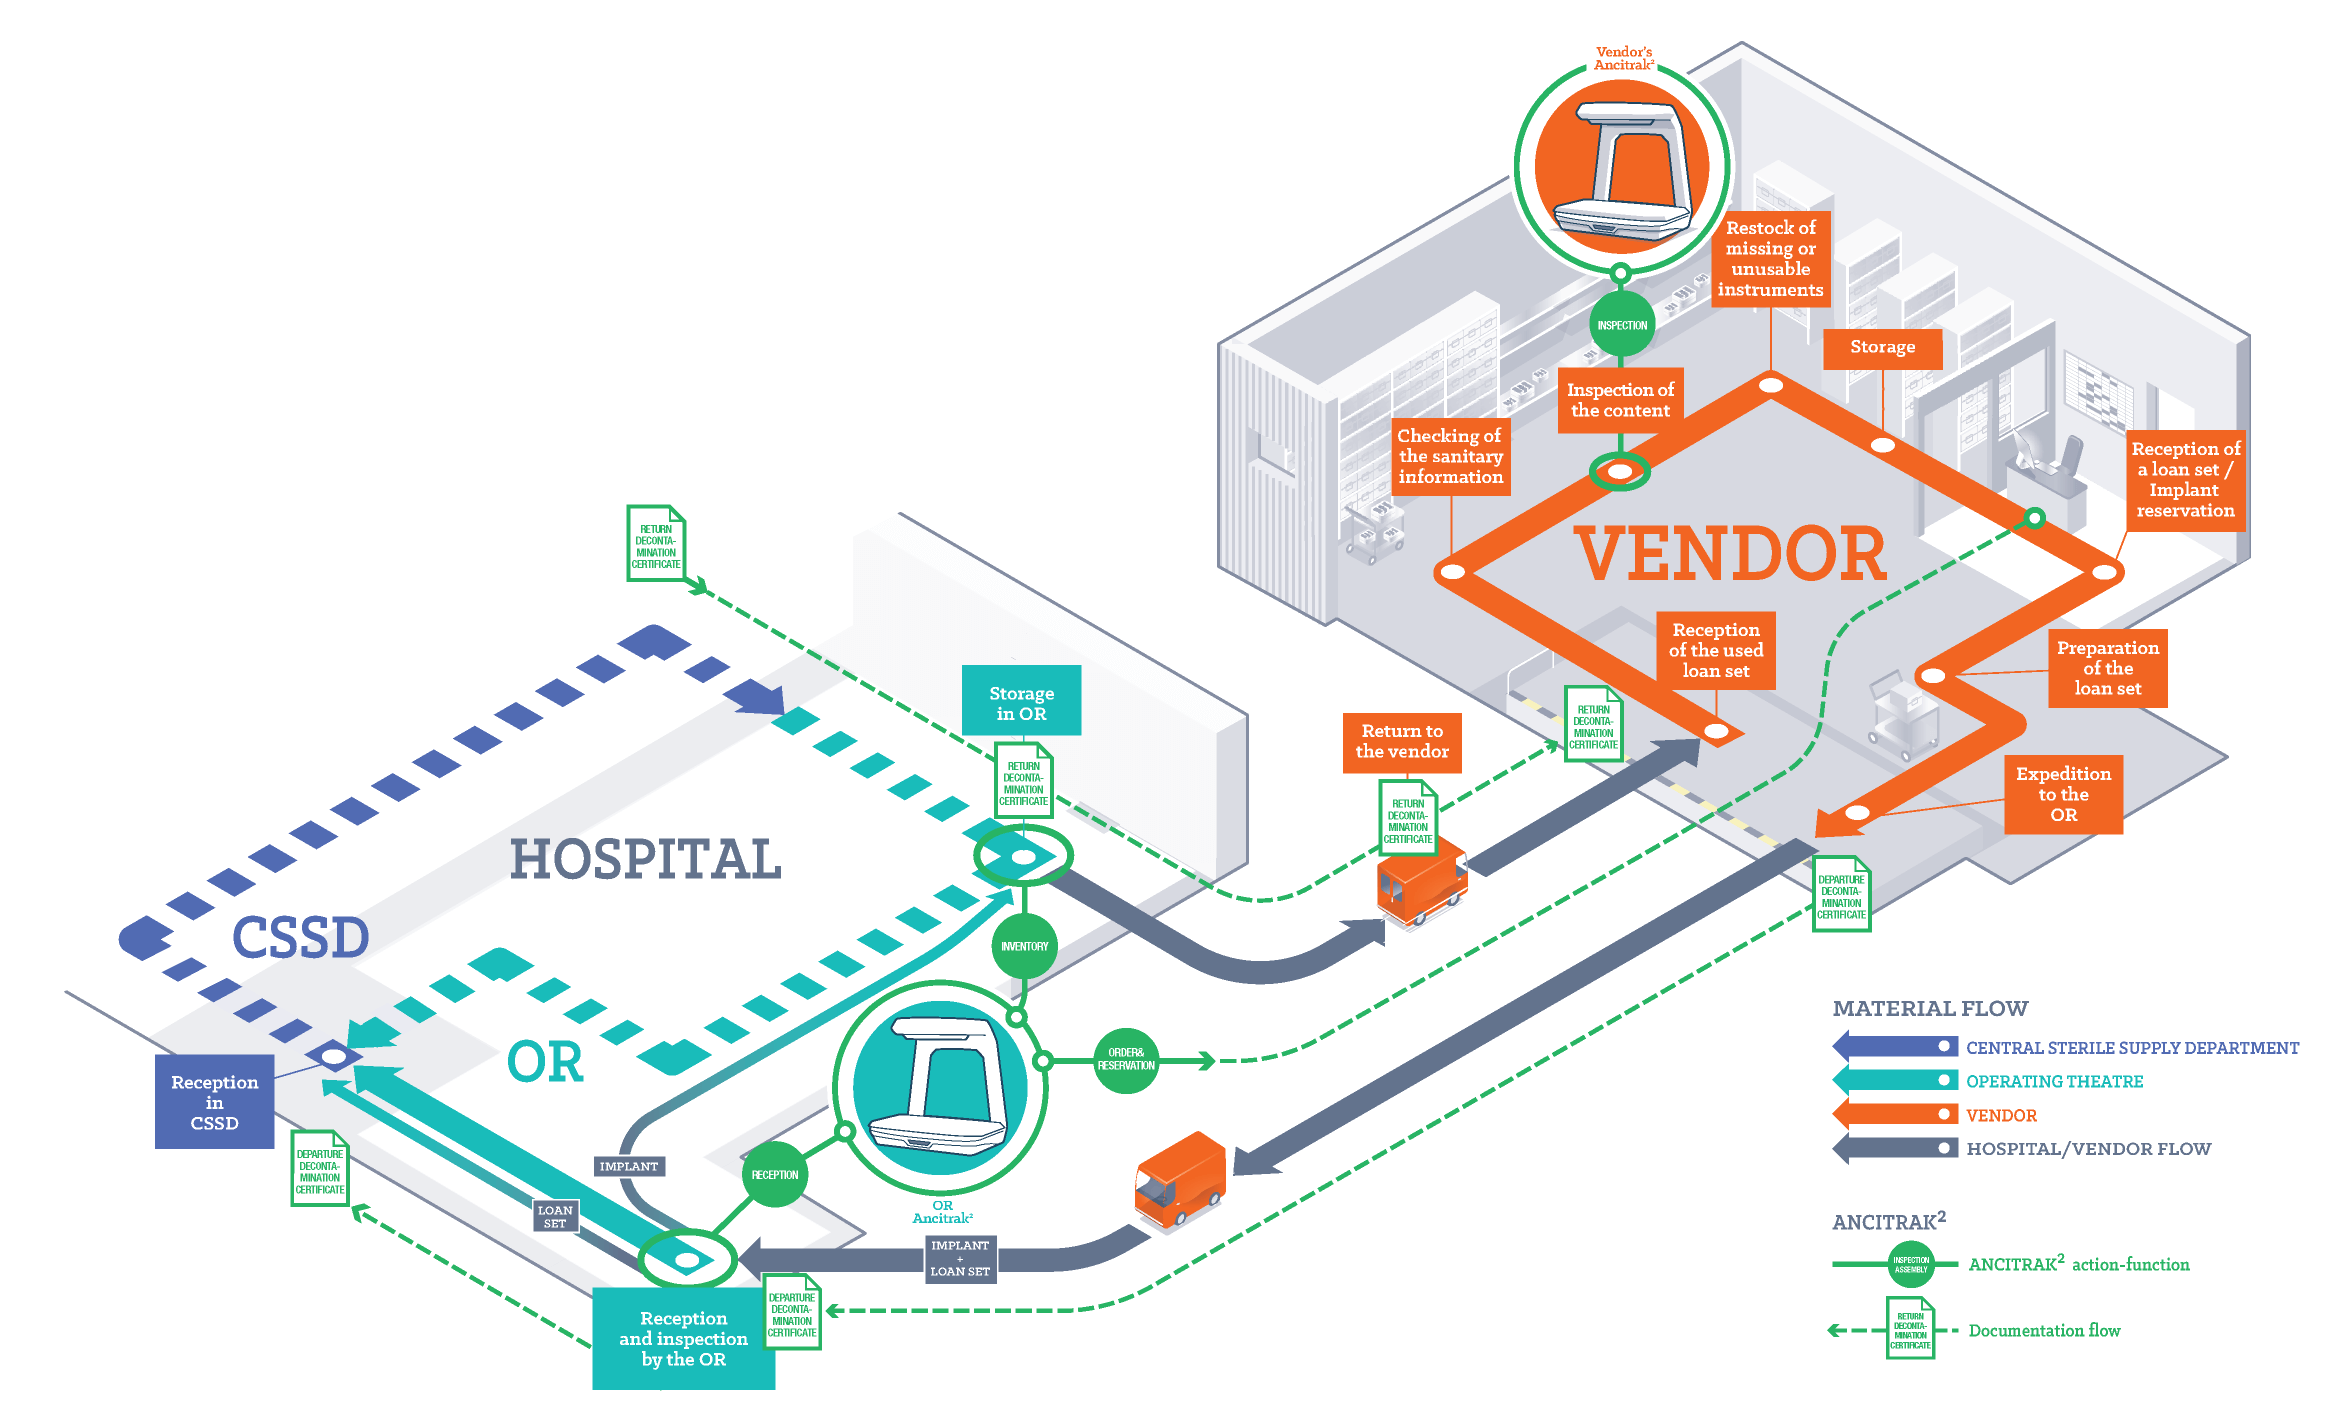 imrove workflow between hospital and vendor